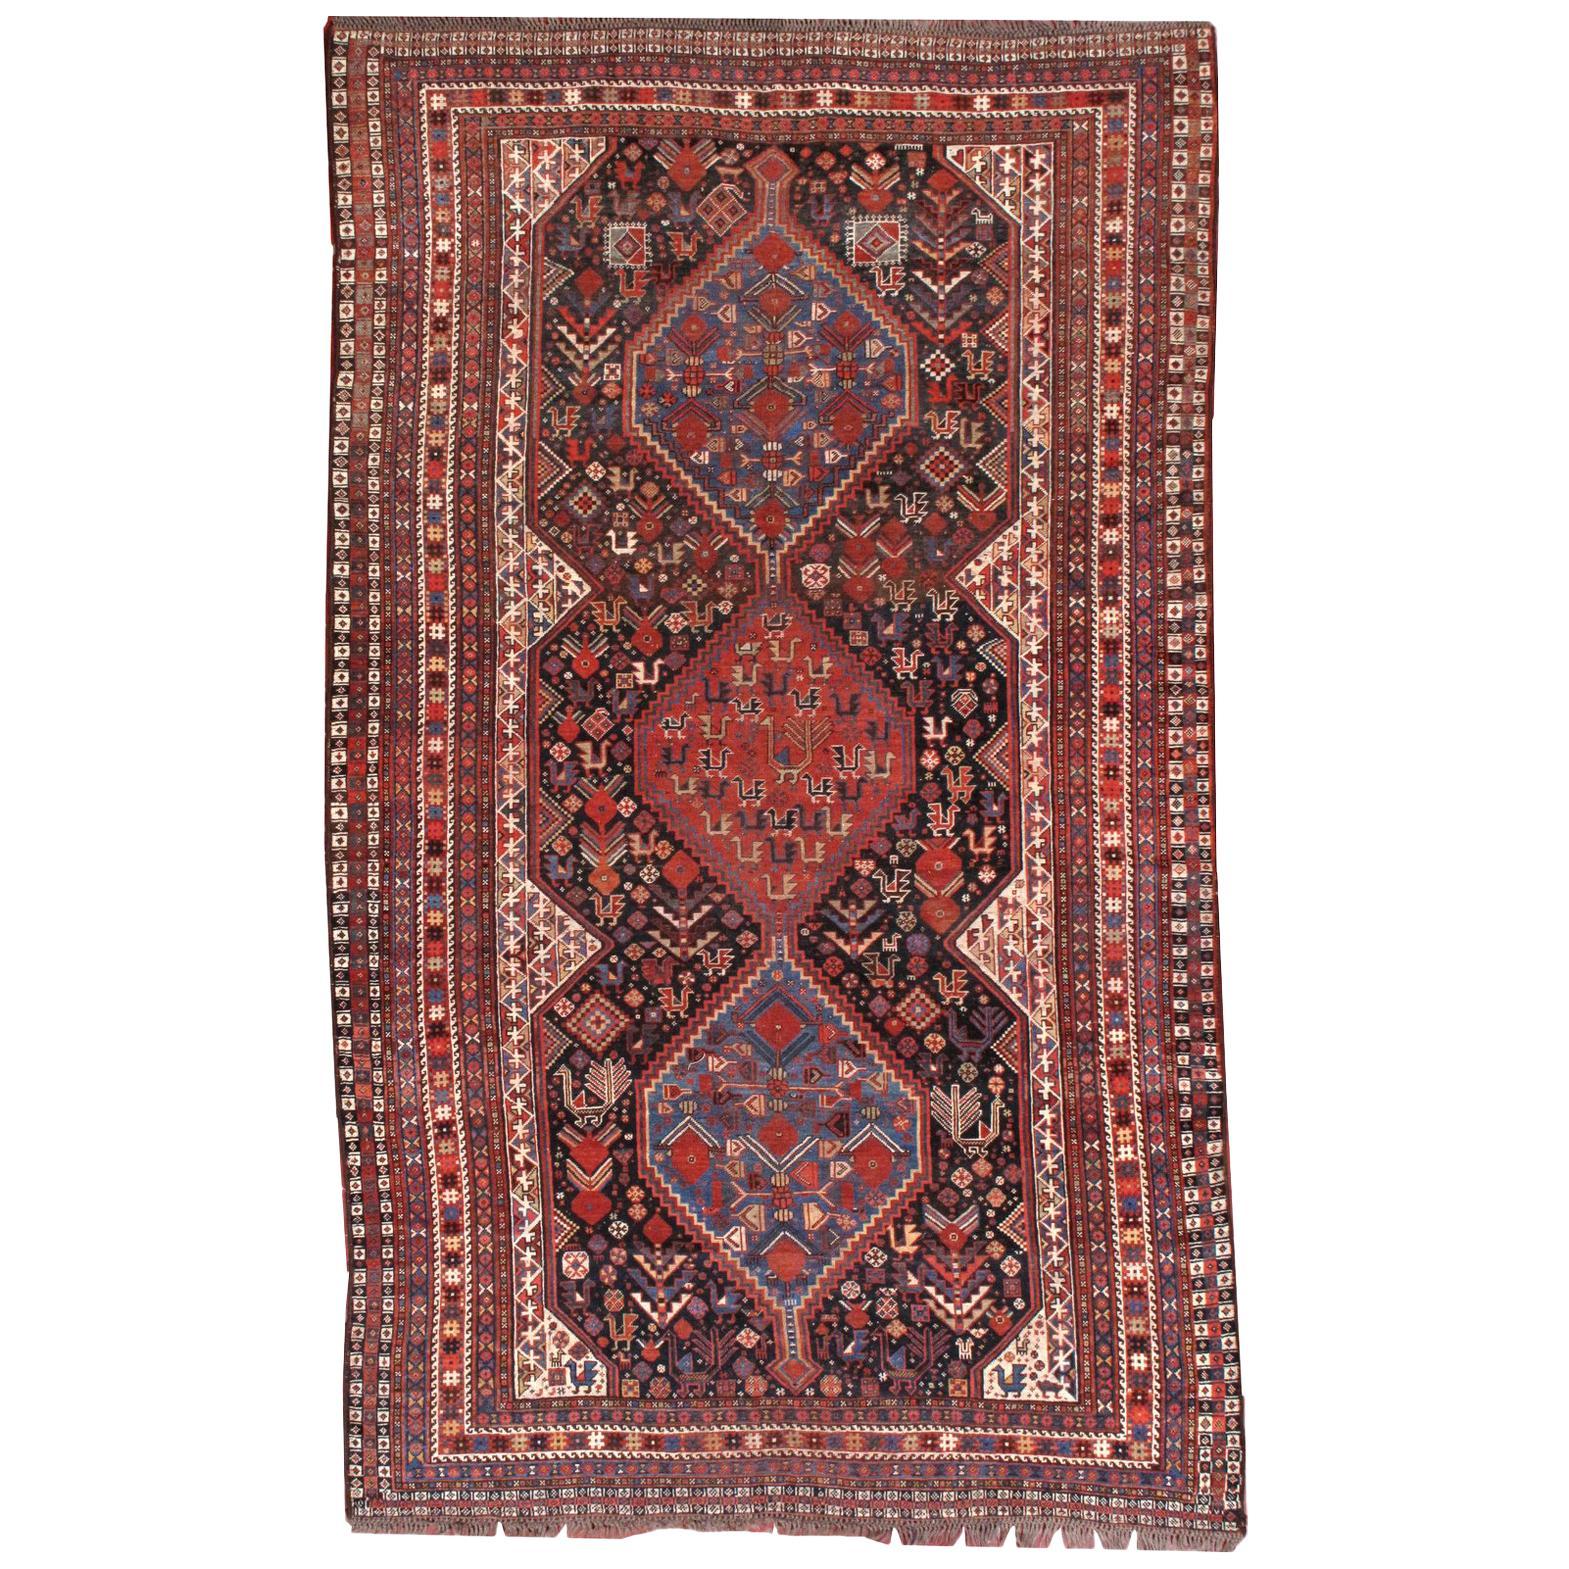 Handmade Antique Khamseh Style Rug, 1880s, 1B193